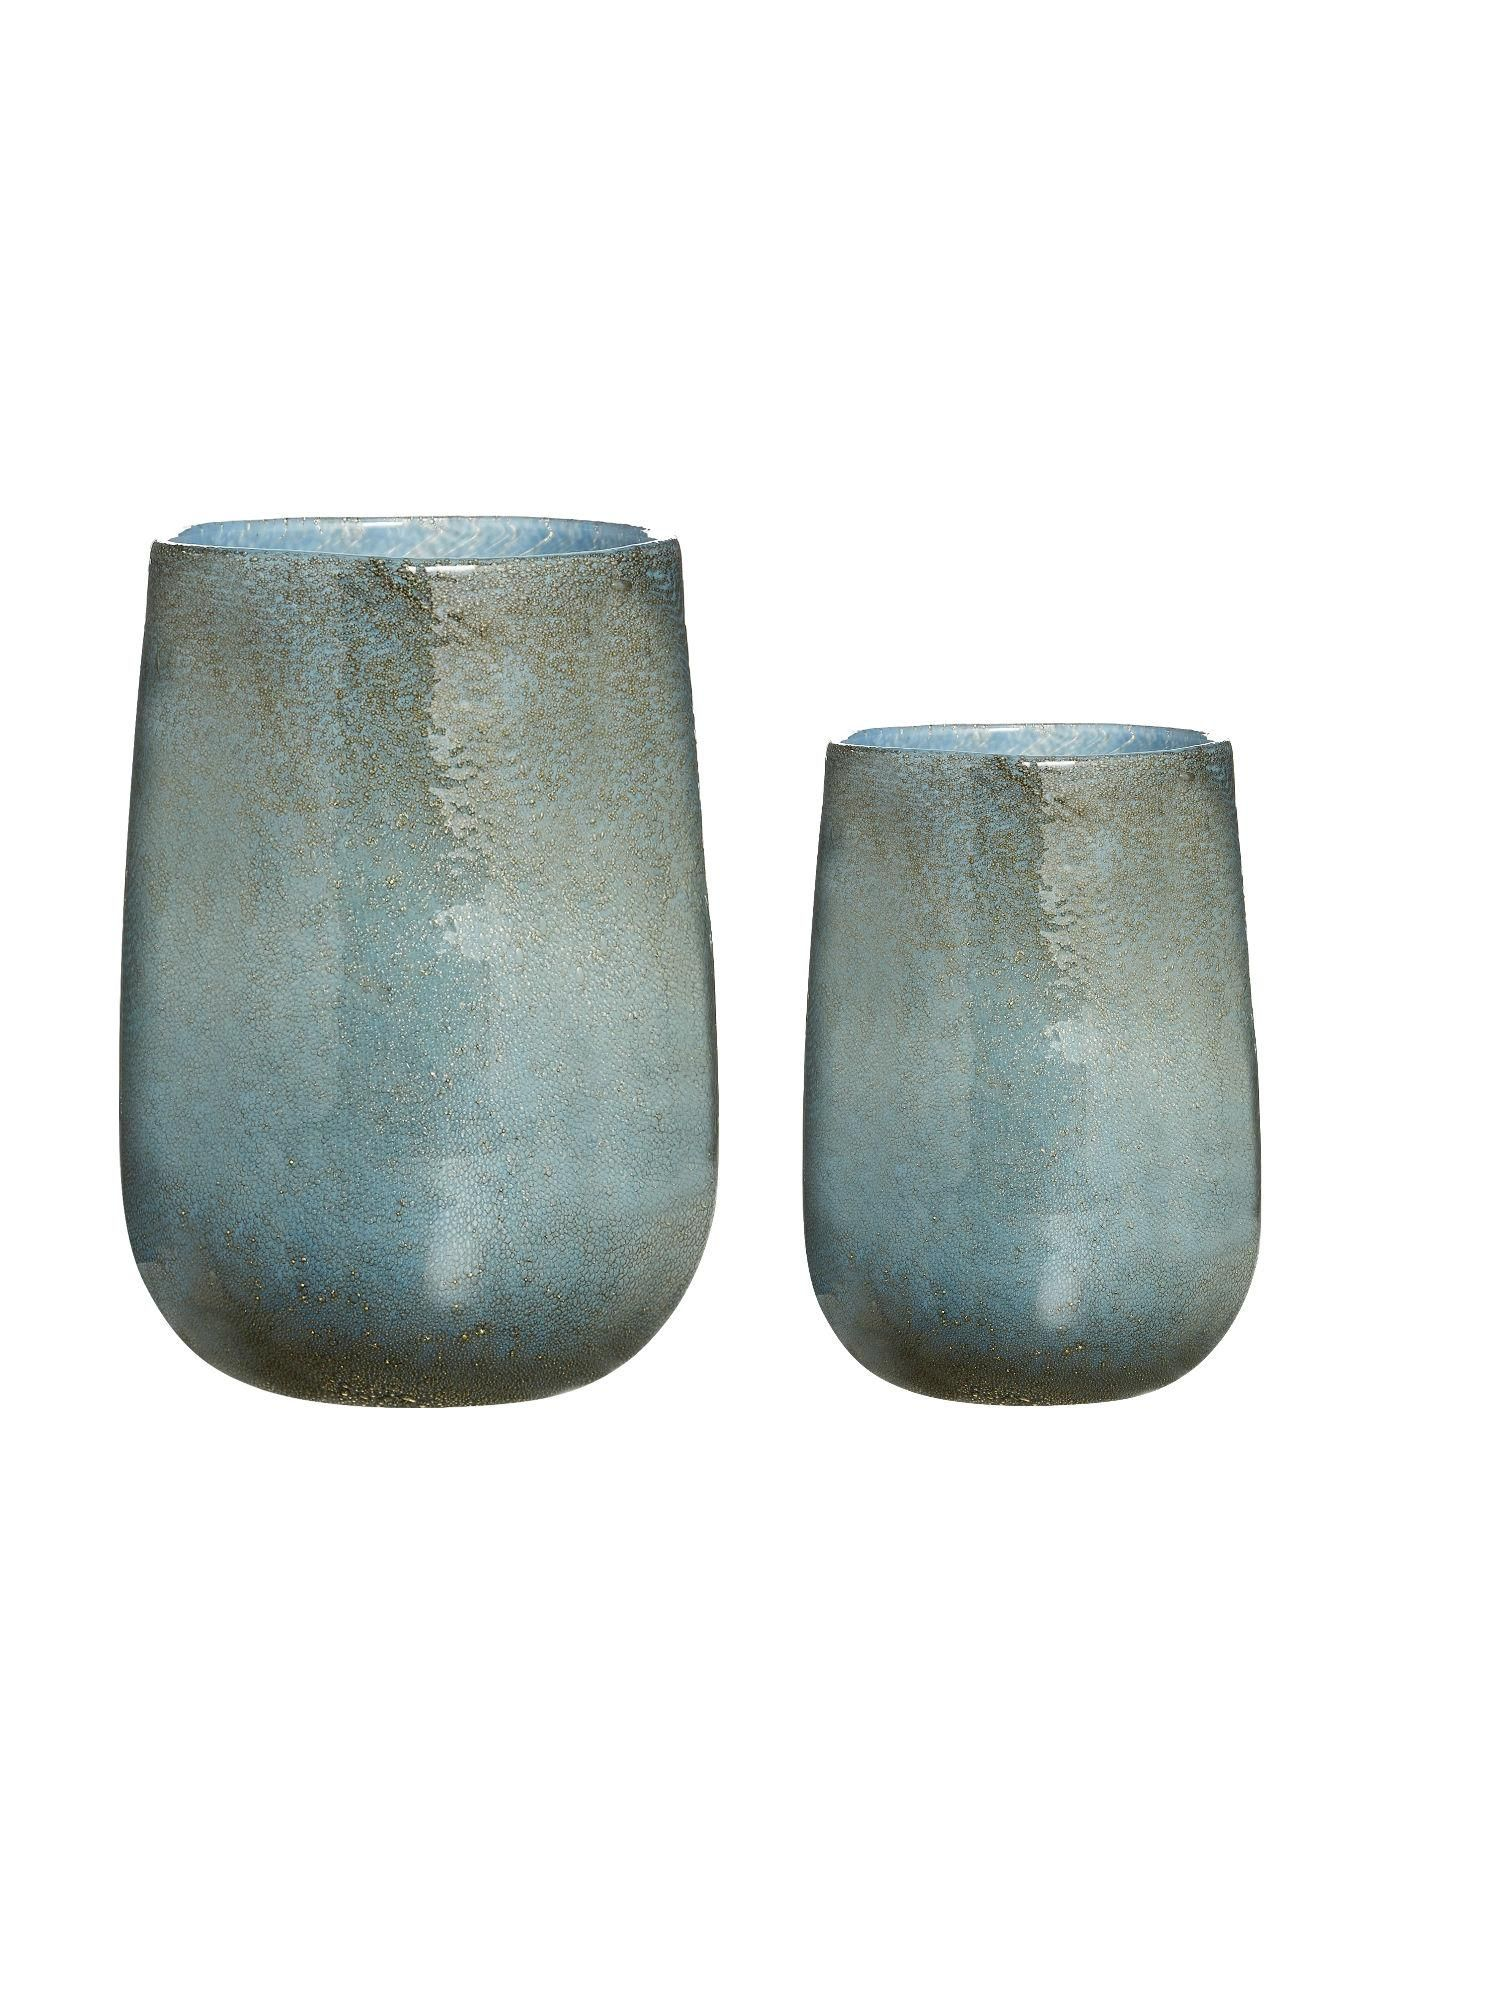 House of fraser green vase - Buy Your Biba Madison Deep Blue Bubble Vase Range Online Now At House Of Fraser